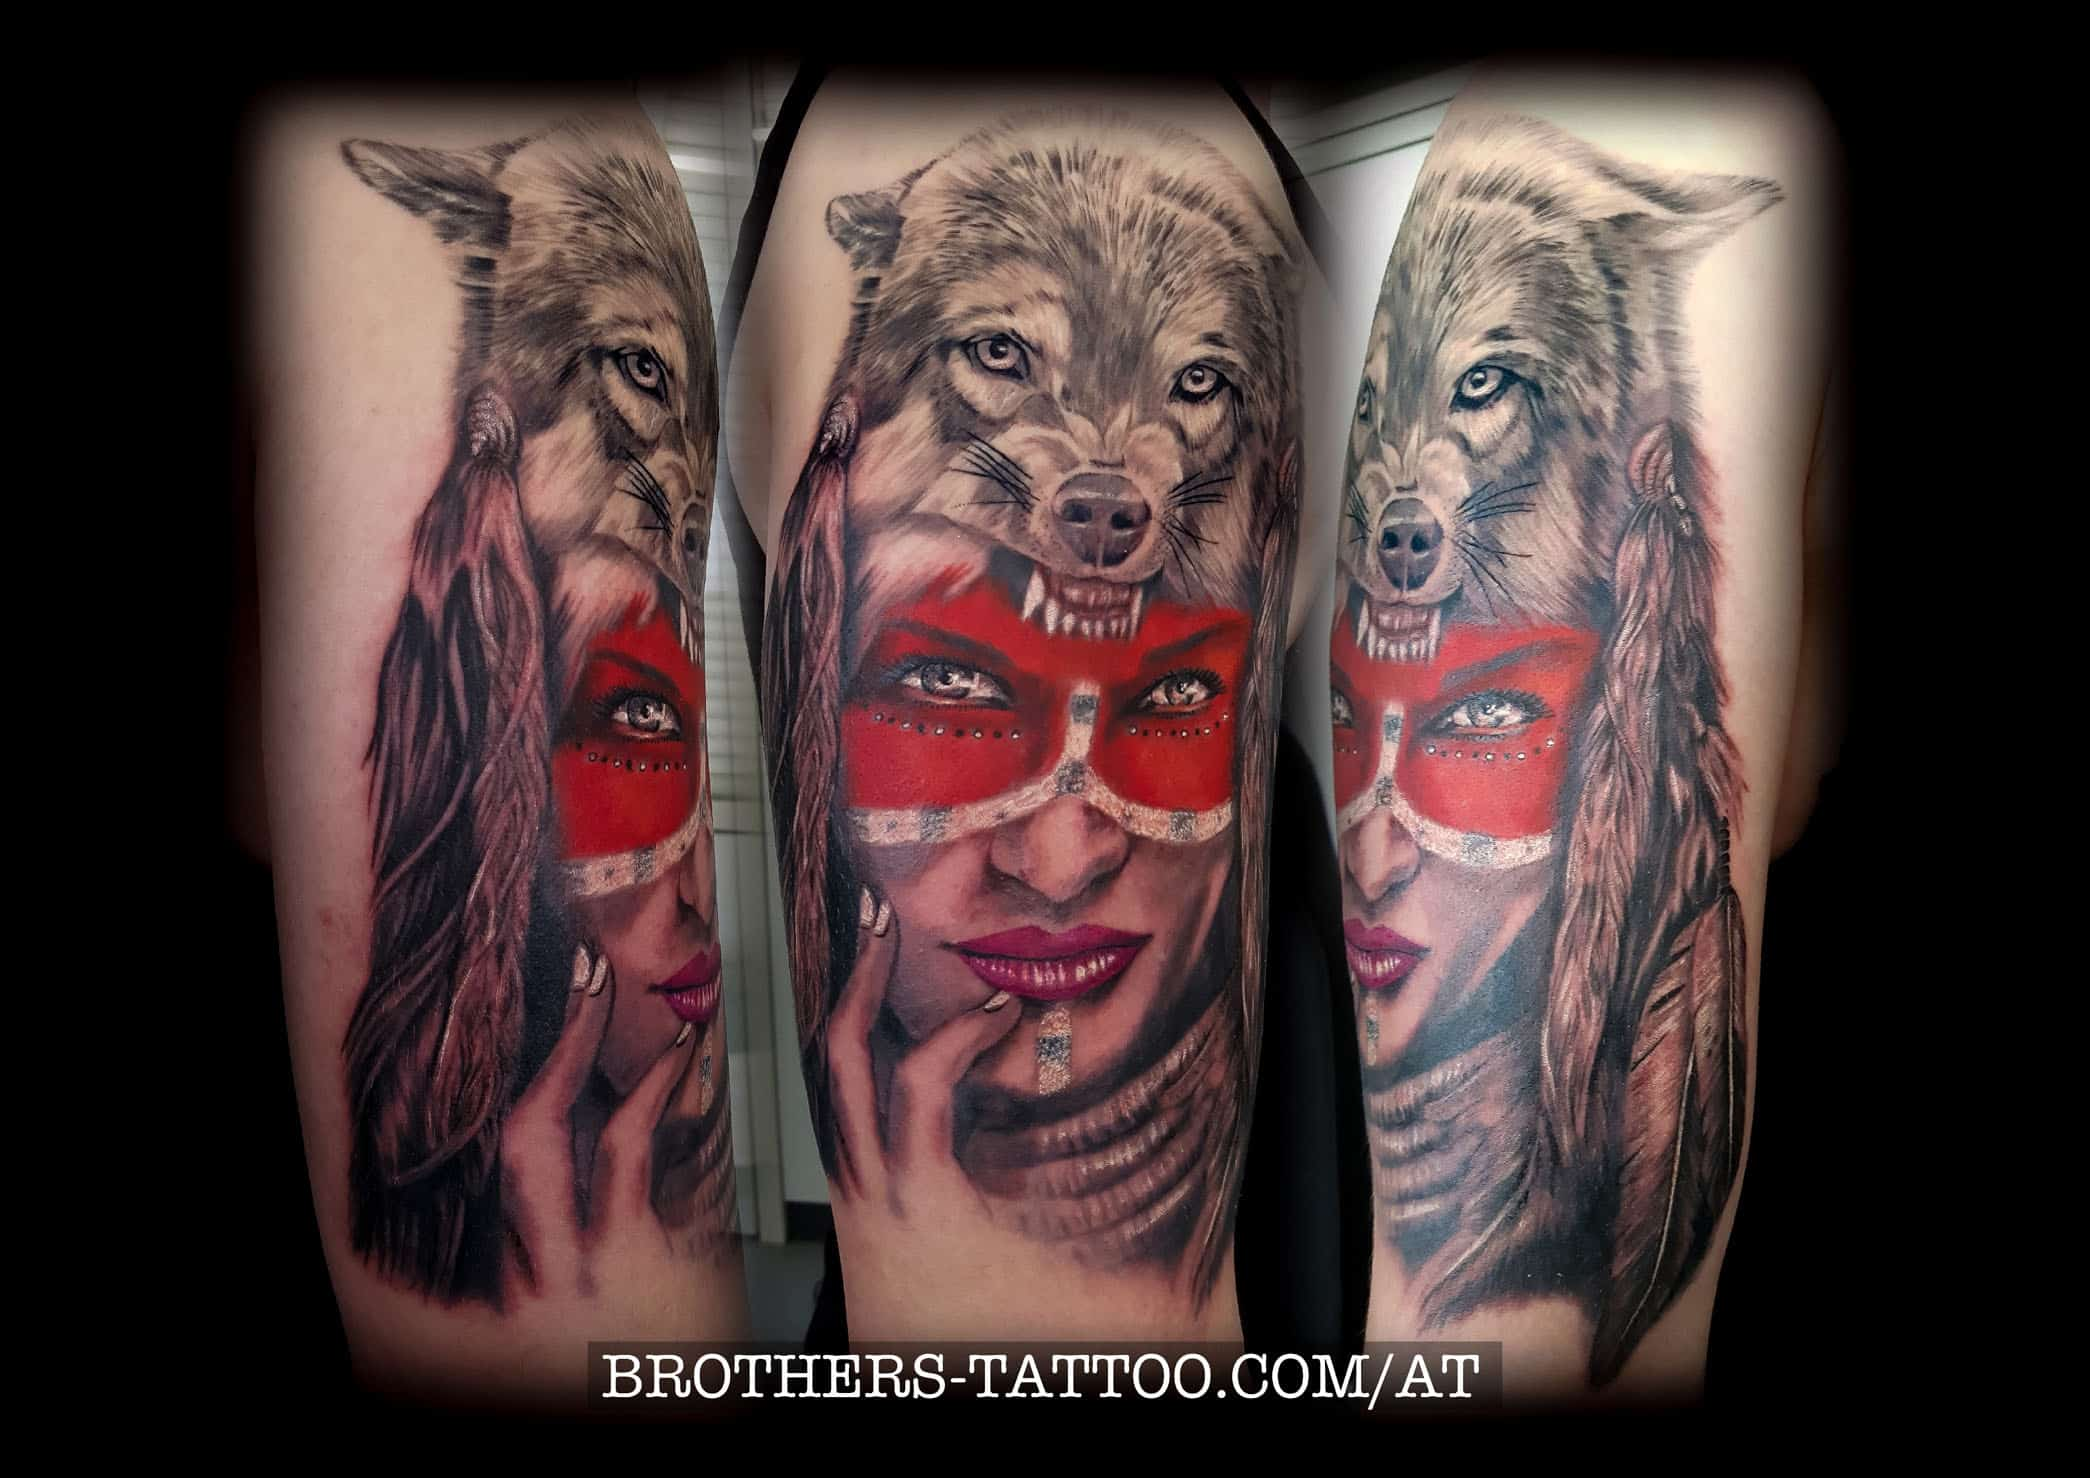 Wolf + Frau Tattoo in Rottönen tätowiert